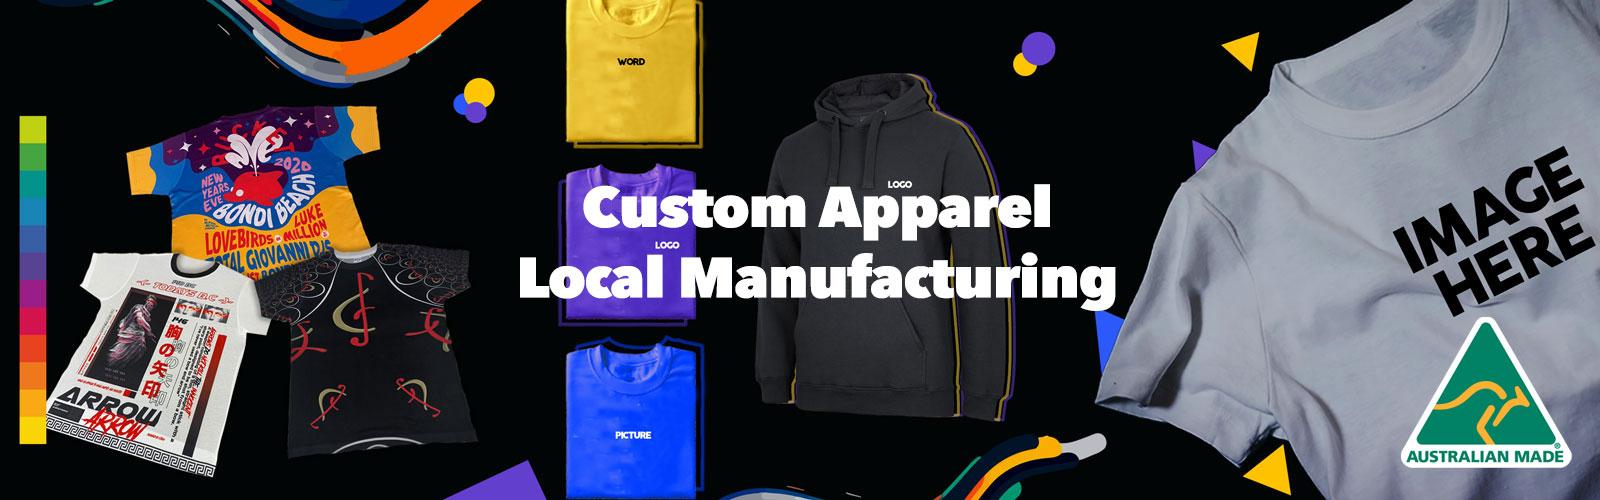 Custom Apparel @ Image Digital